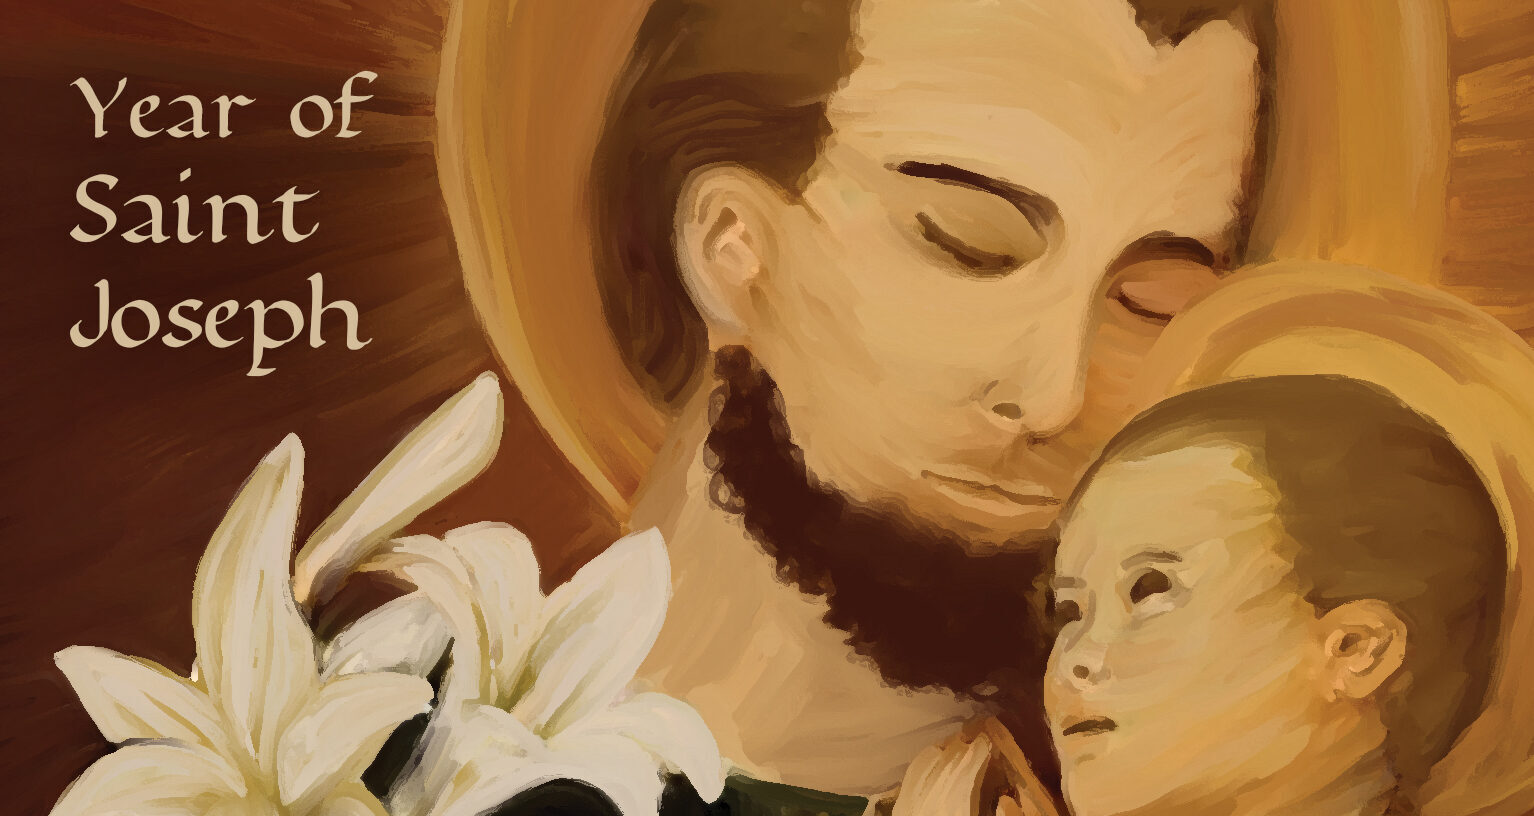 Celebrate the Year of St. Joseph